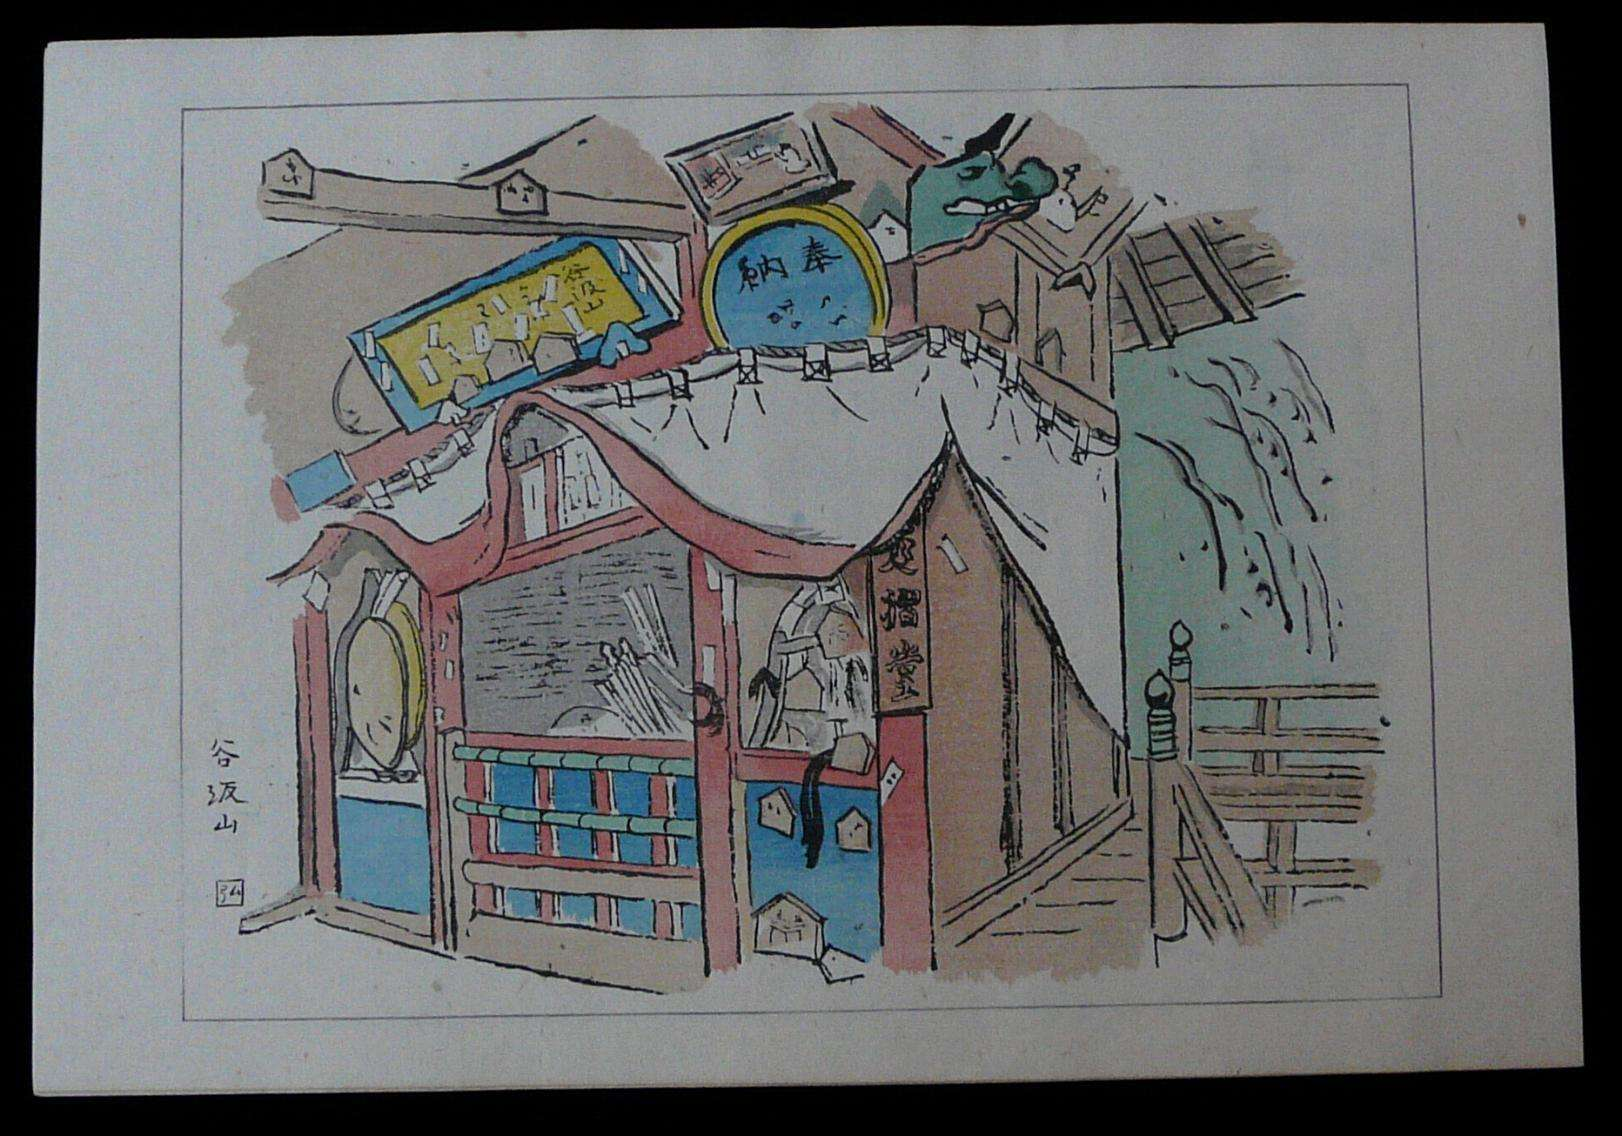 HIROMITSU NAKAZAWA: #P2929 ORIGINAL FIRST EDITION JAPANESE WOODBLOCK PRINT